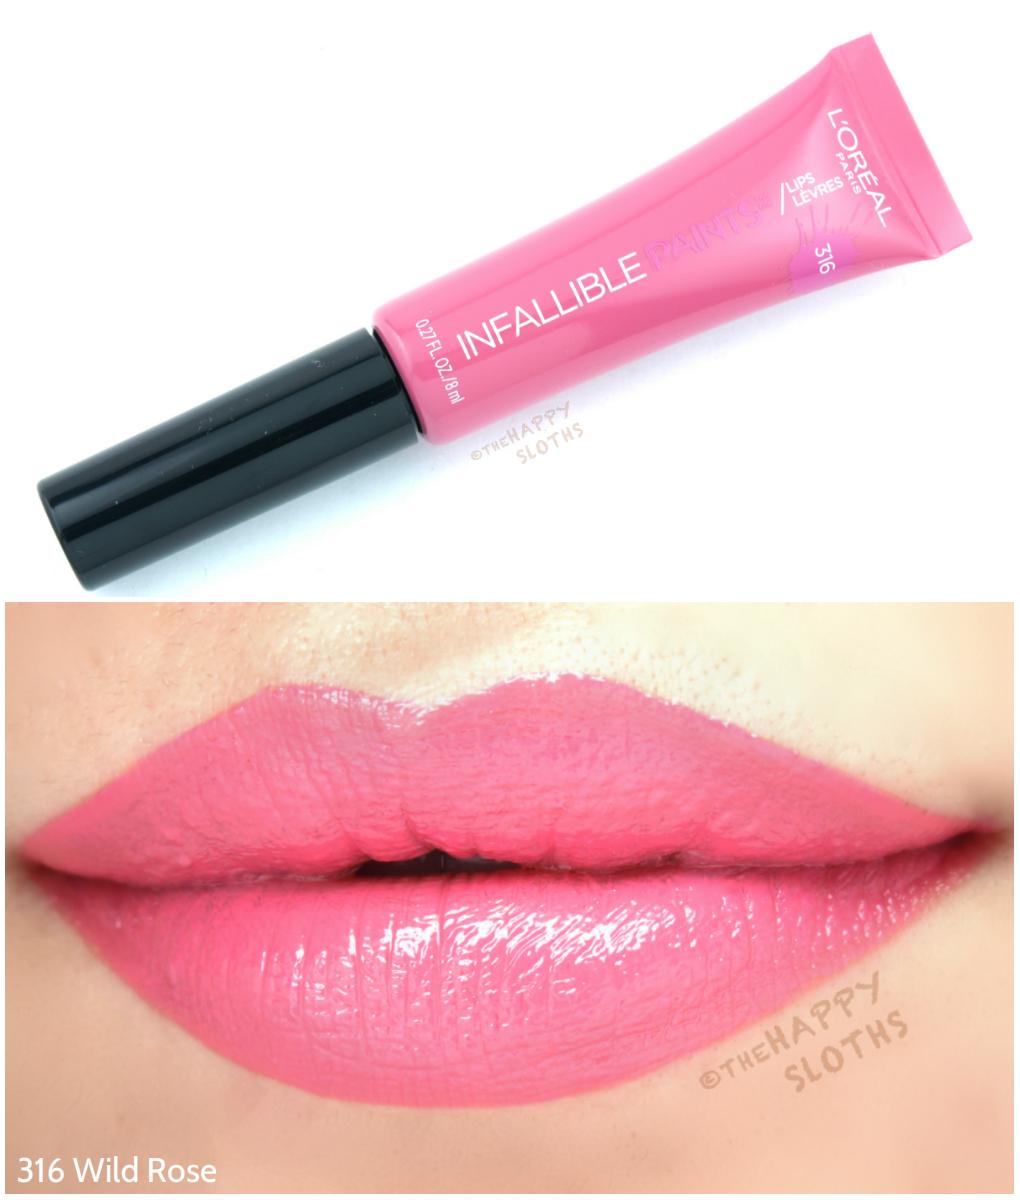 L'Oreal Infallible Lip Paints 316 Wild Rose